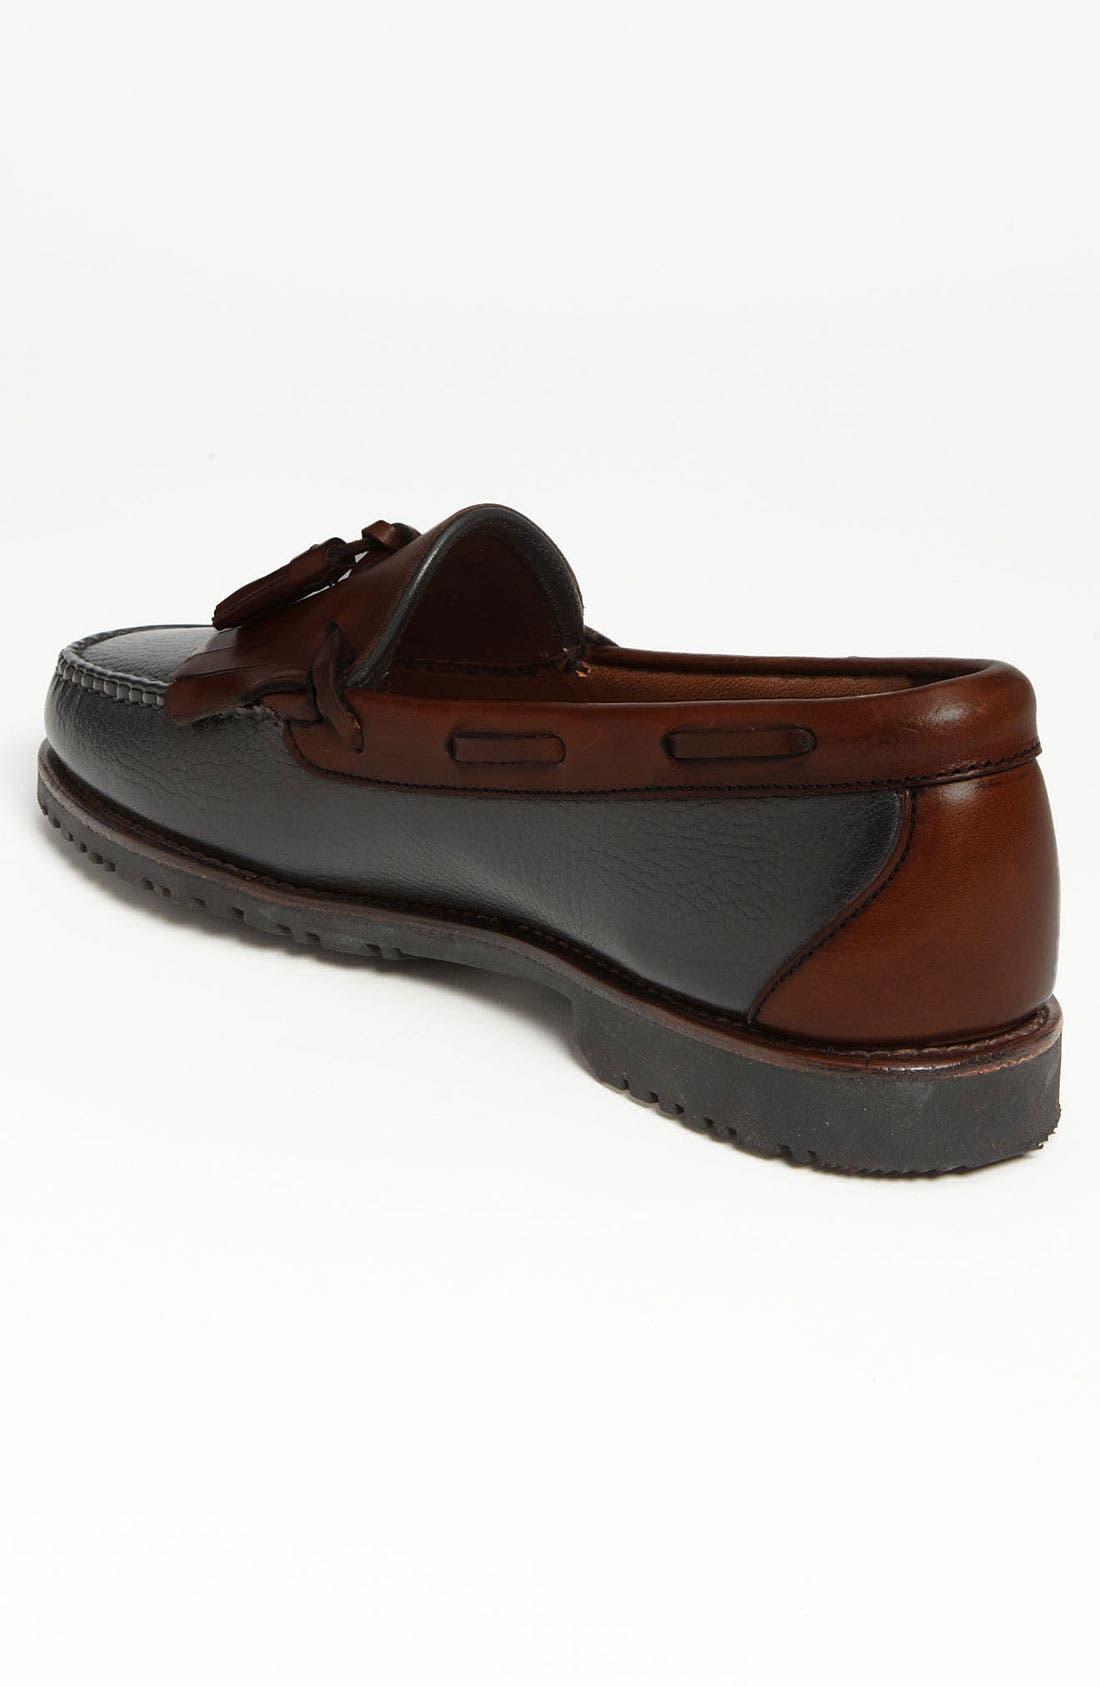 'Nashua' Tassel Loafer,                             Alternate thumbnail 6, color,                             BLACK/ BROWN